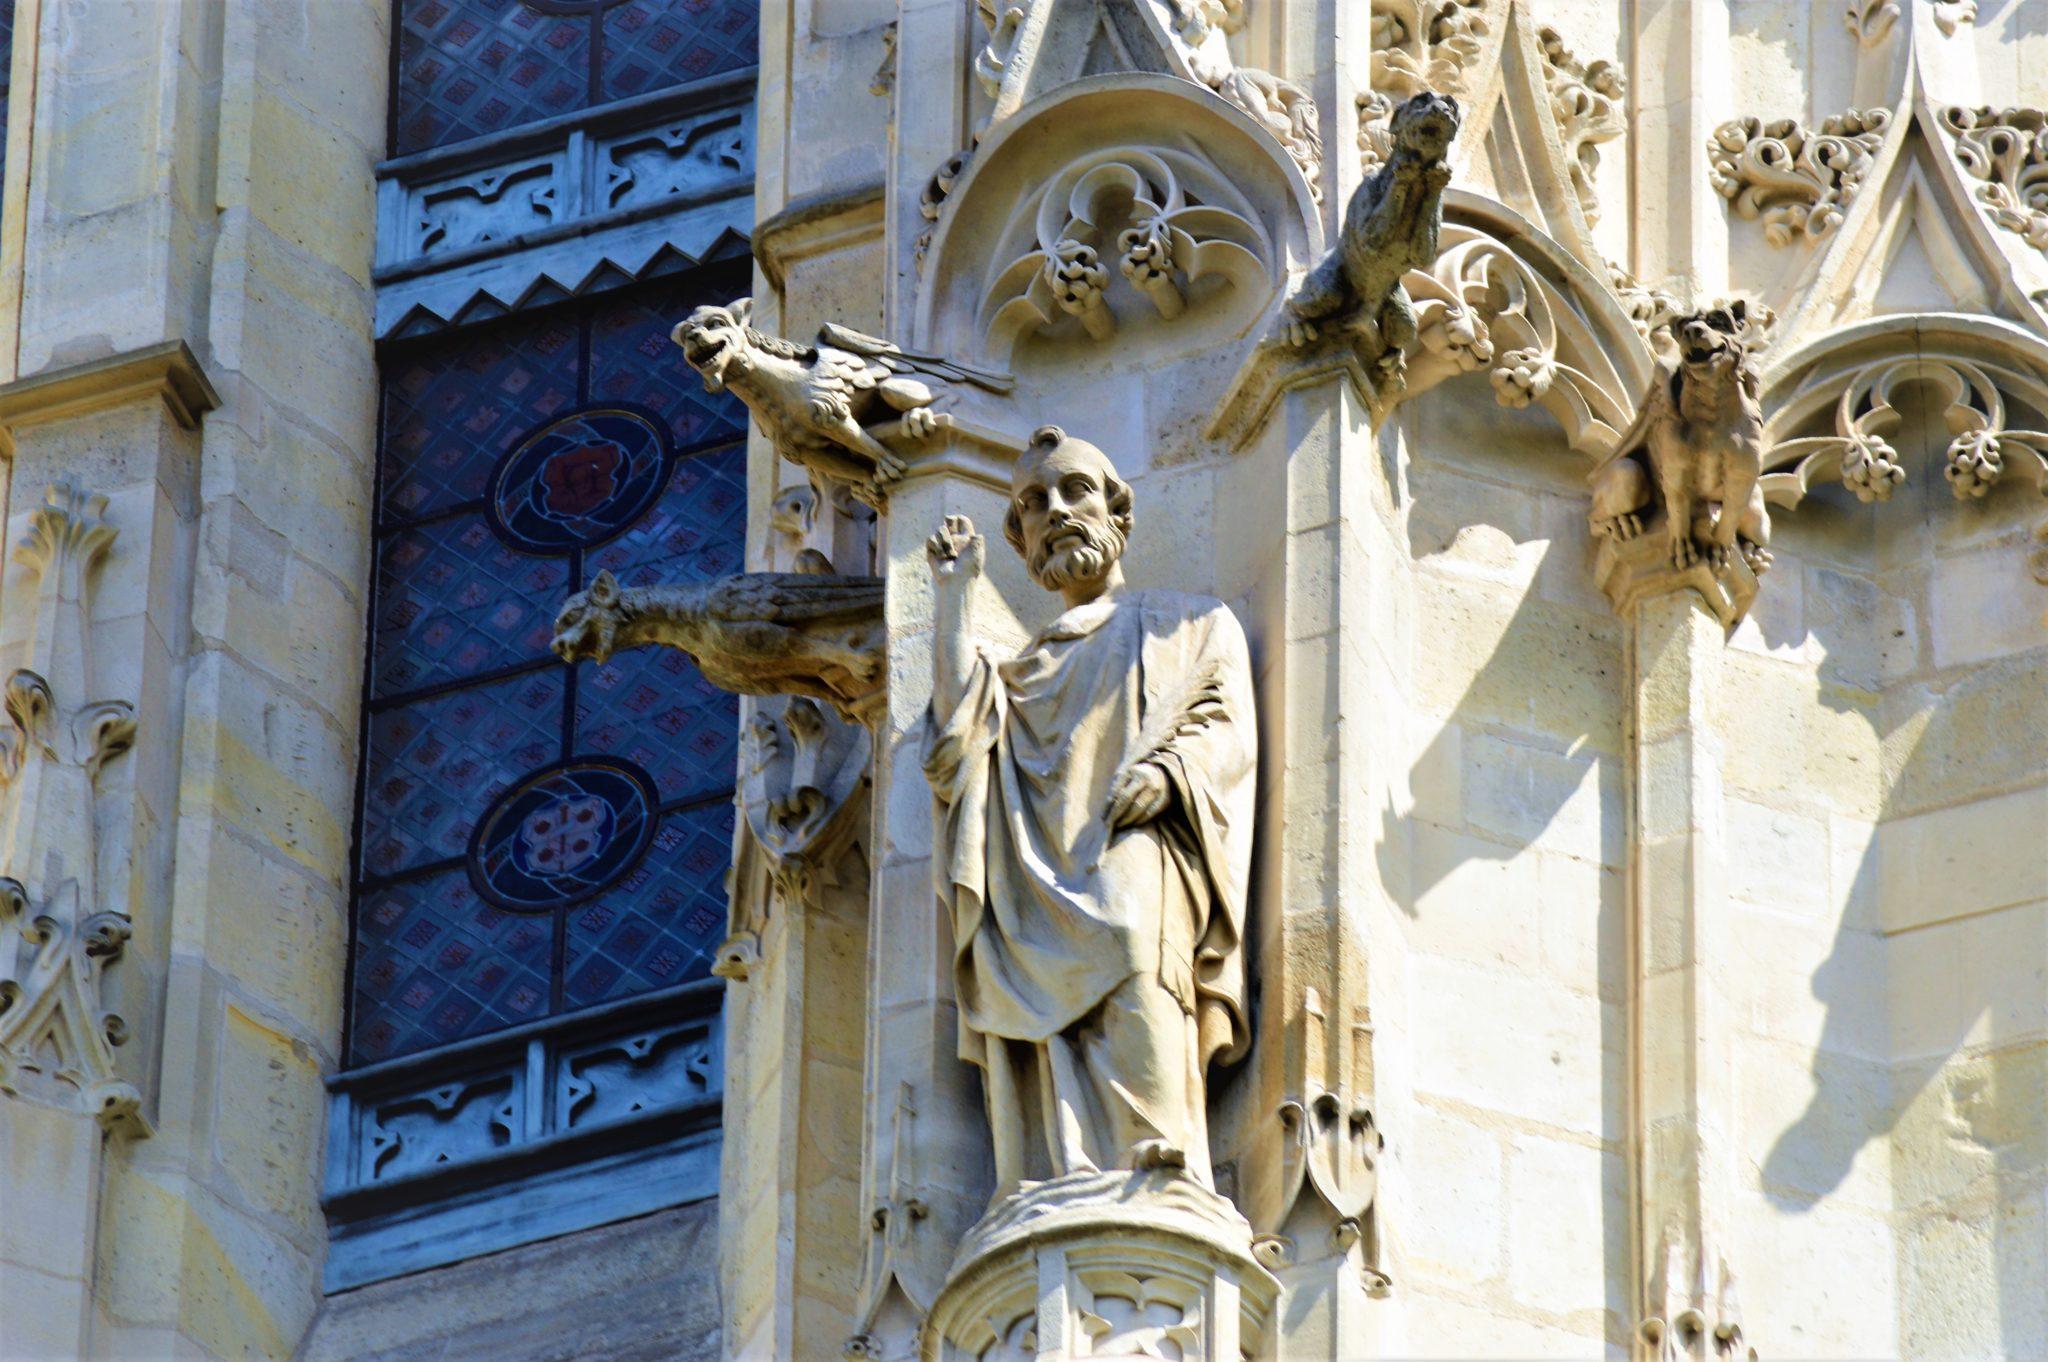 Art work on building in Paris, France